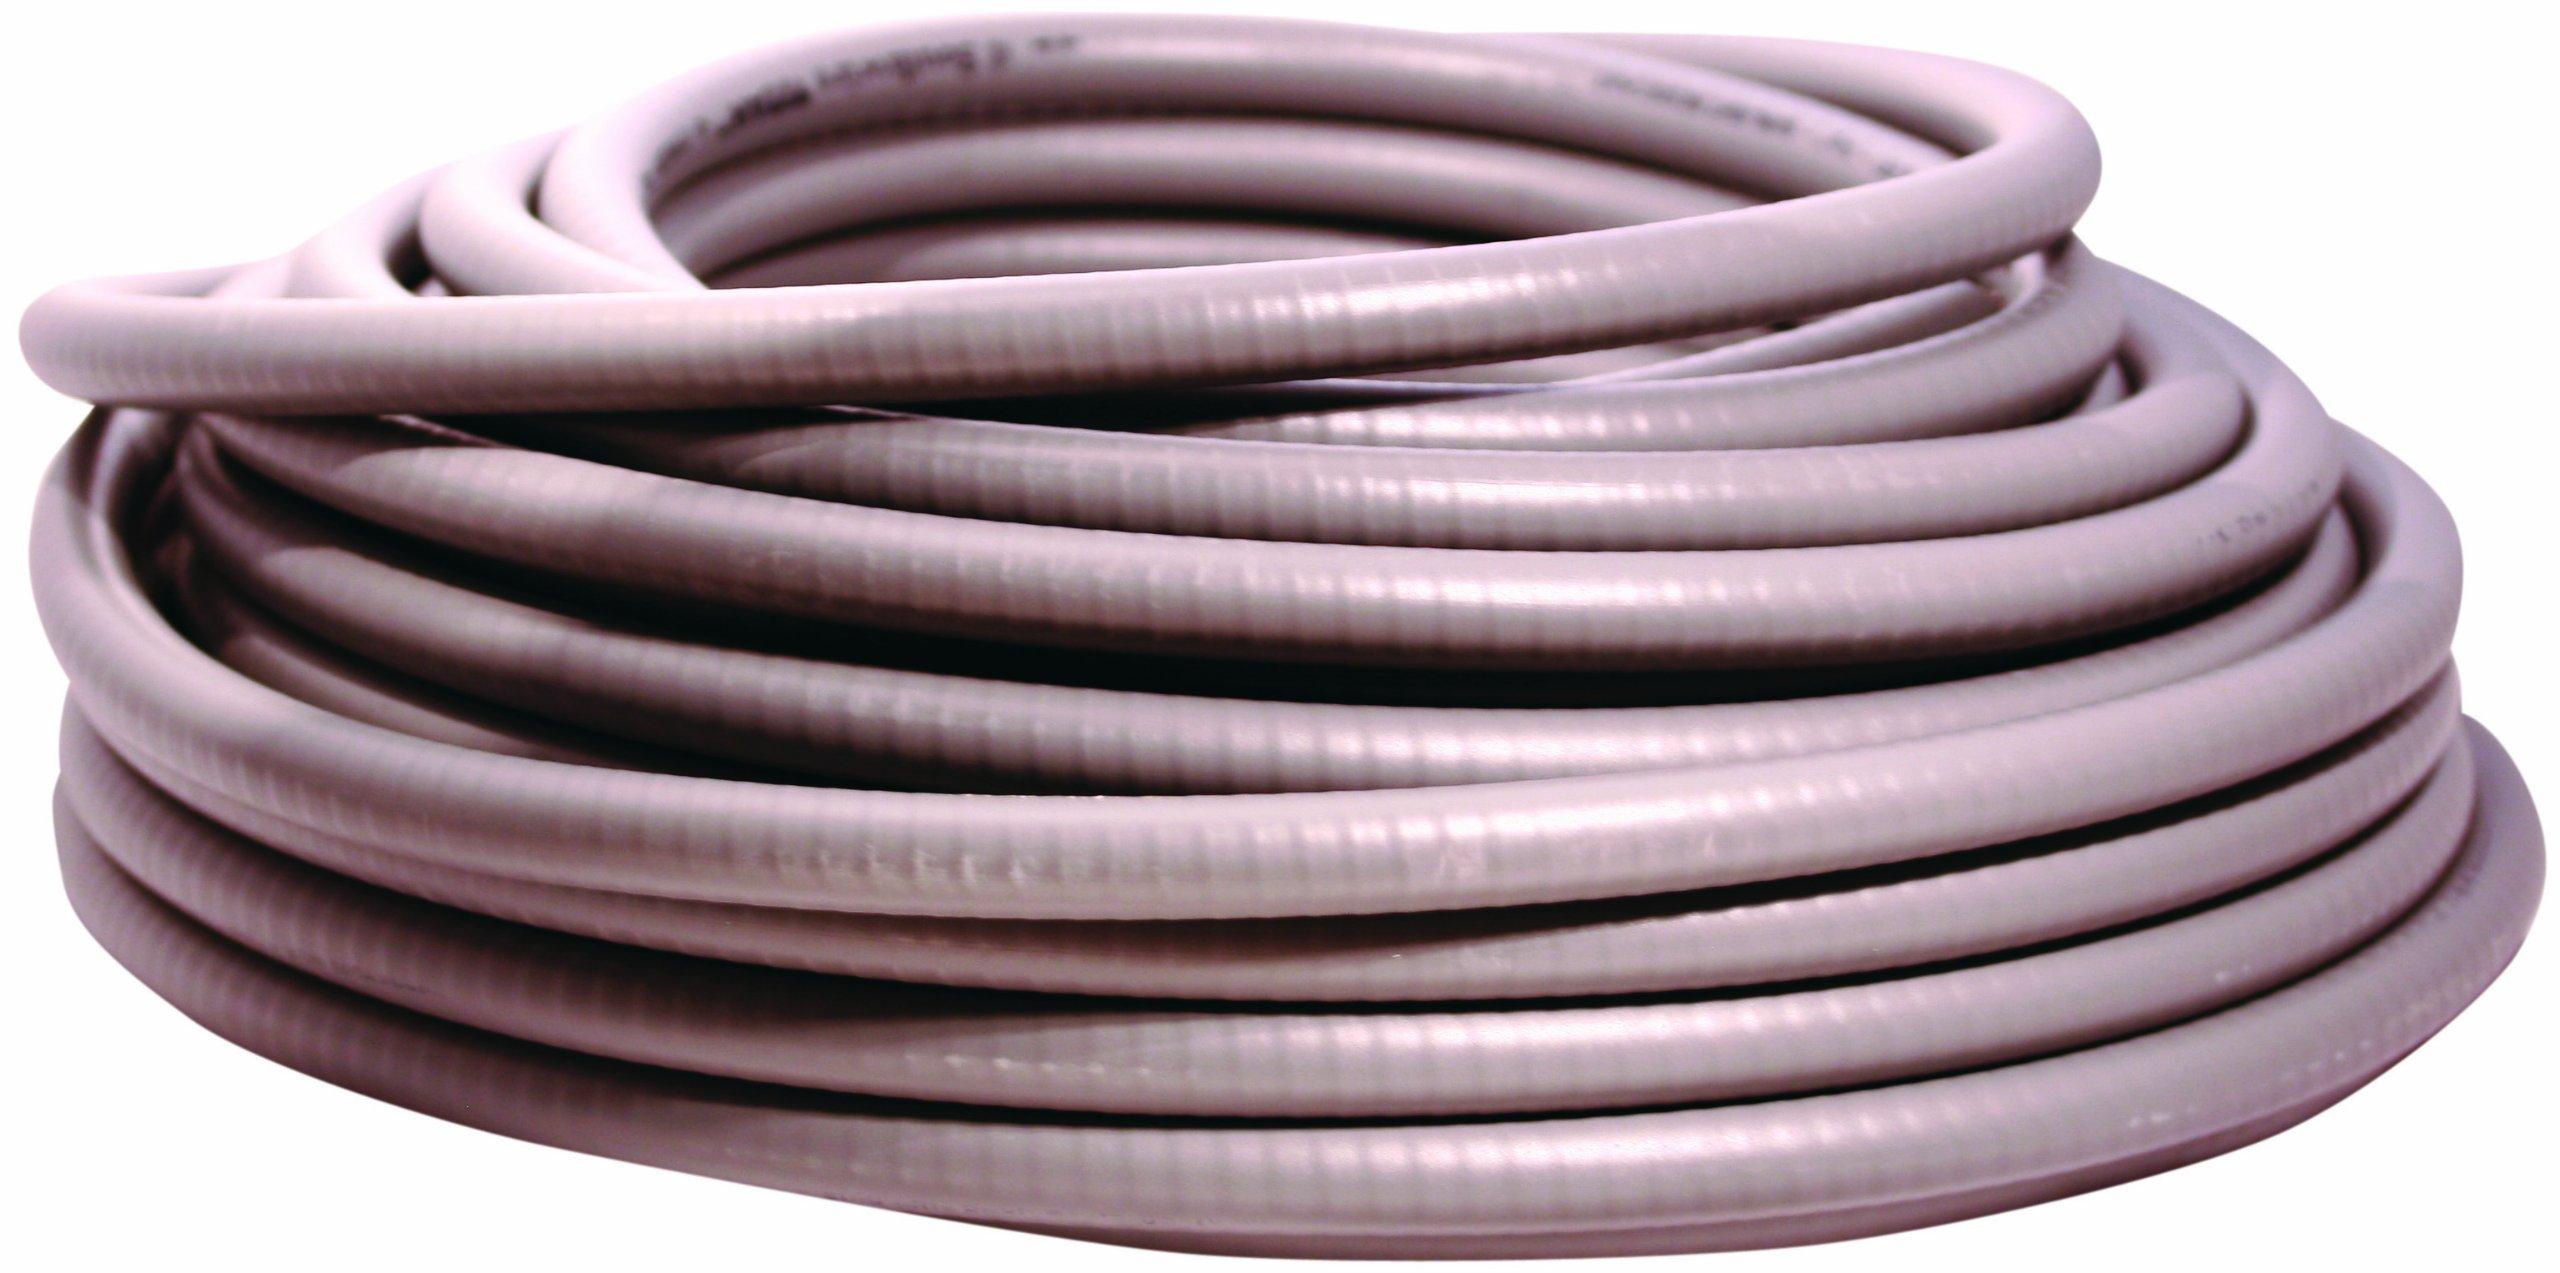 Southwire 55082703 Liqua Flex 3/4-Inch-by-100-Foot Flexible Liquidtight Metallic Conduit